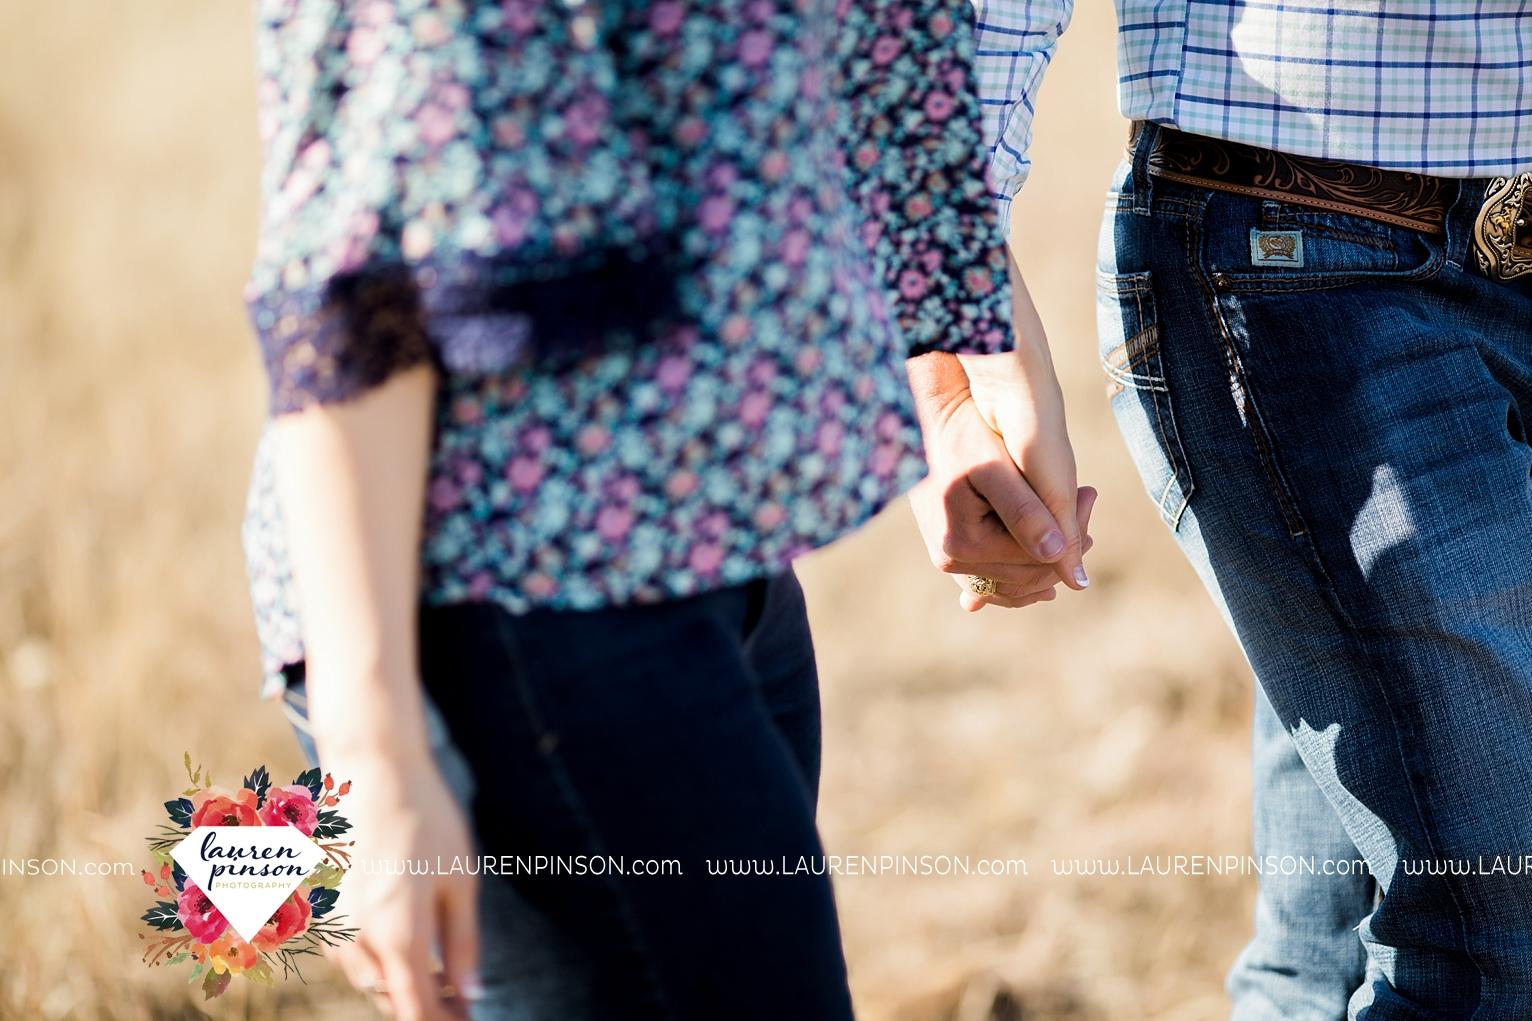 wichita-falls-texas-engagement-photographer-wedding-oklahoma-lawton-wichita-mountains-refuge-outdoors-mountains-engaged_2039.jpg